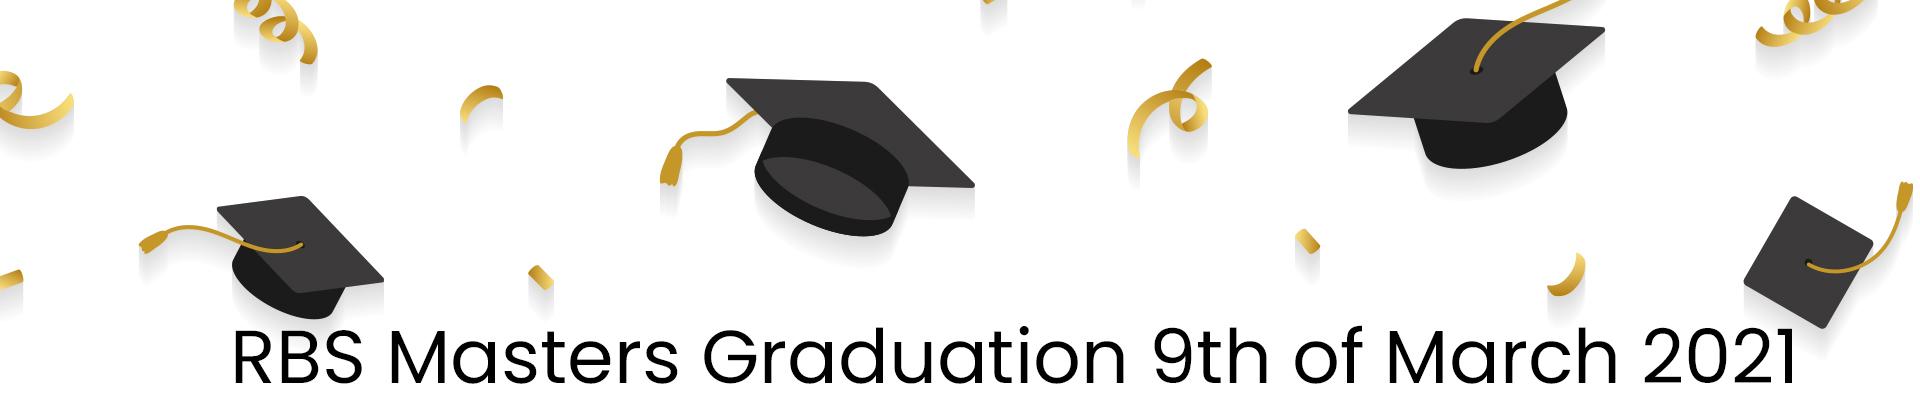 Master Graduation Online Ceremony 9 March 2021